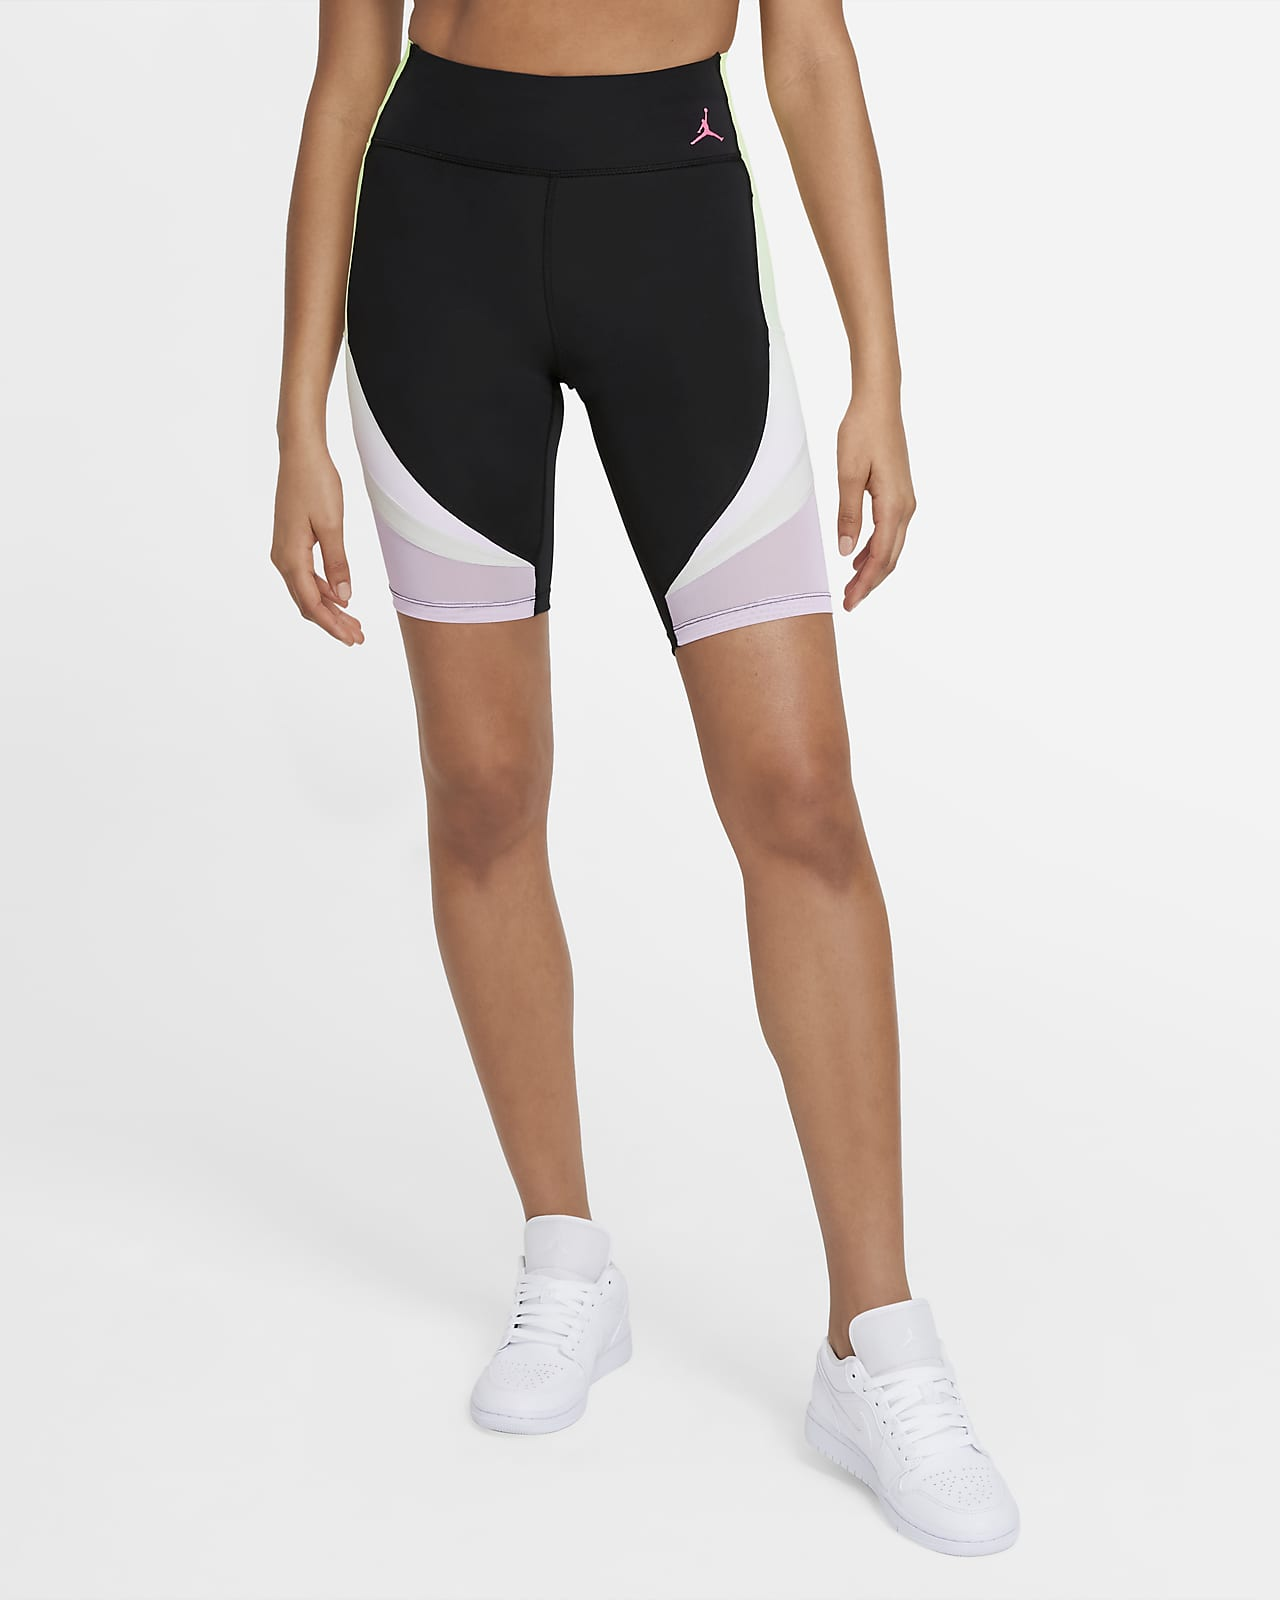 Jordan Heatwave 女子单车短裤